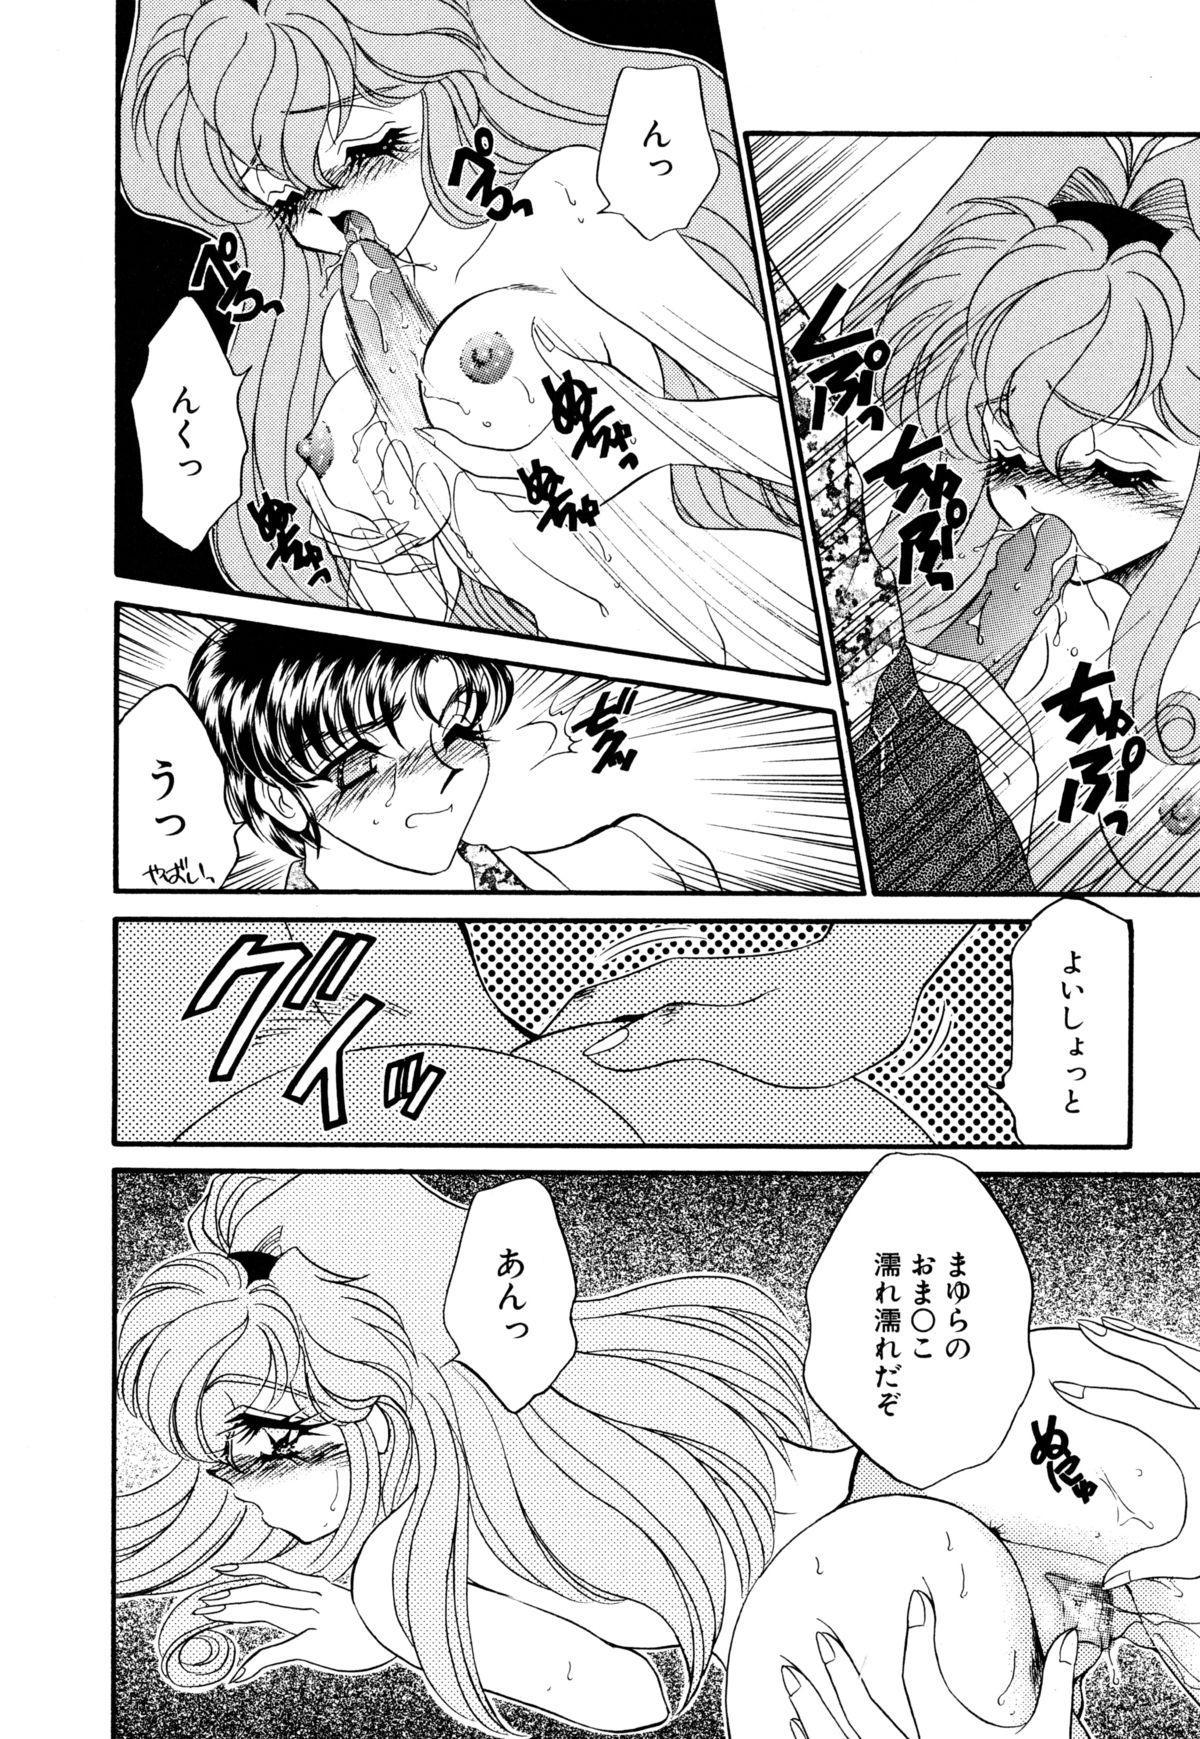 Kigurumi Sentai Quiltian 62